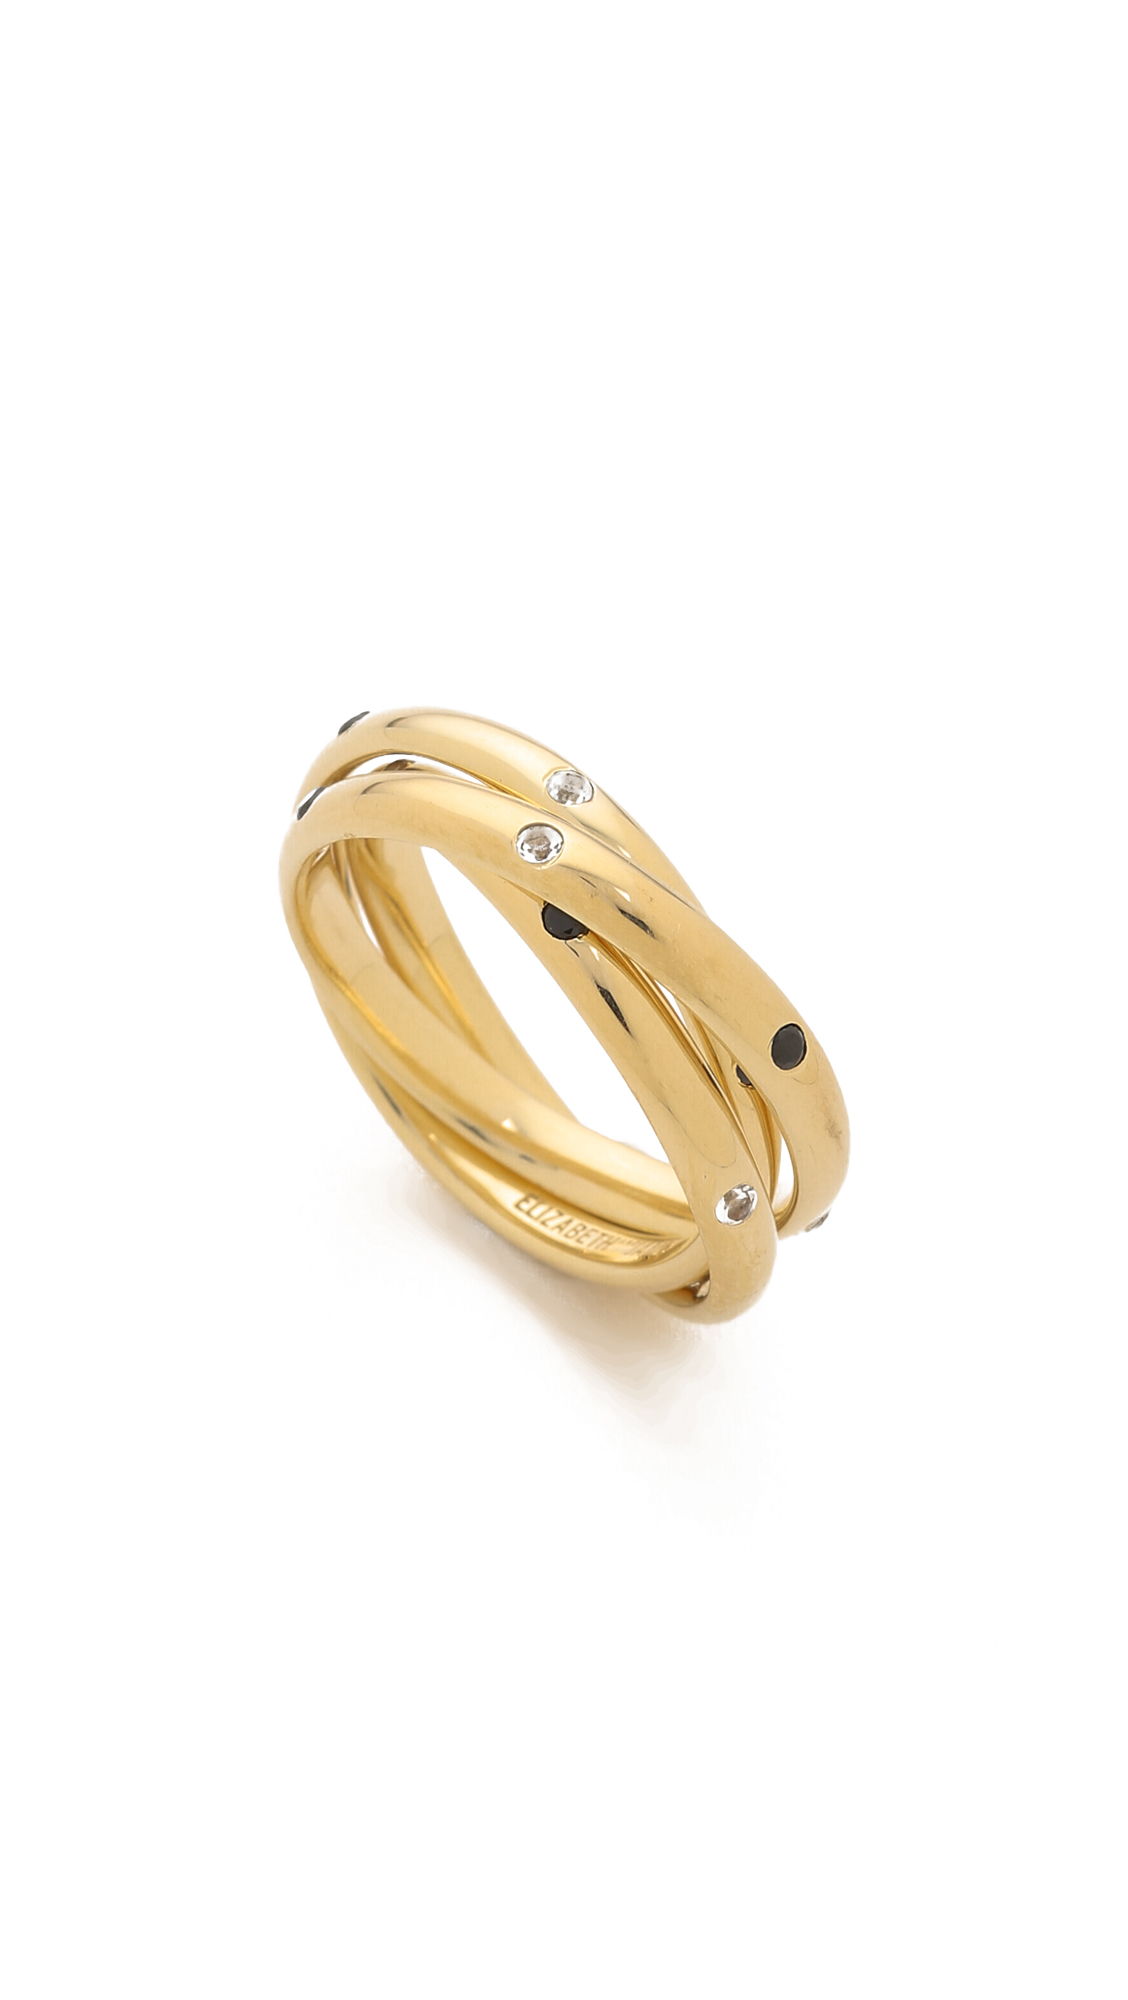 Elizabeth & James Darcy Ring in Metallic Gold bkVWJtSB